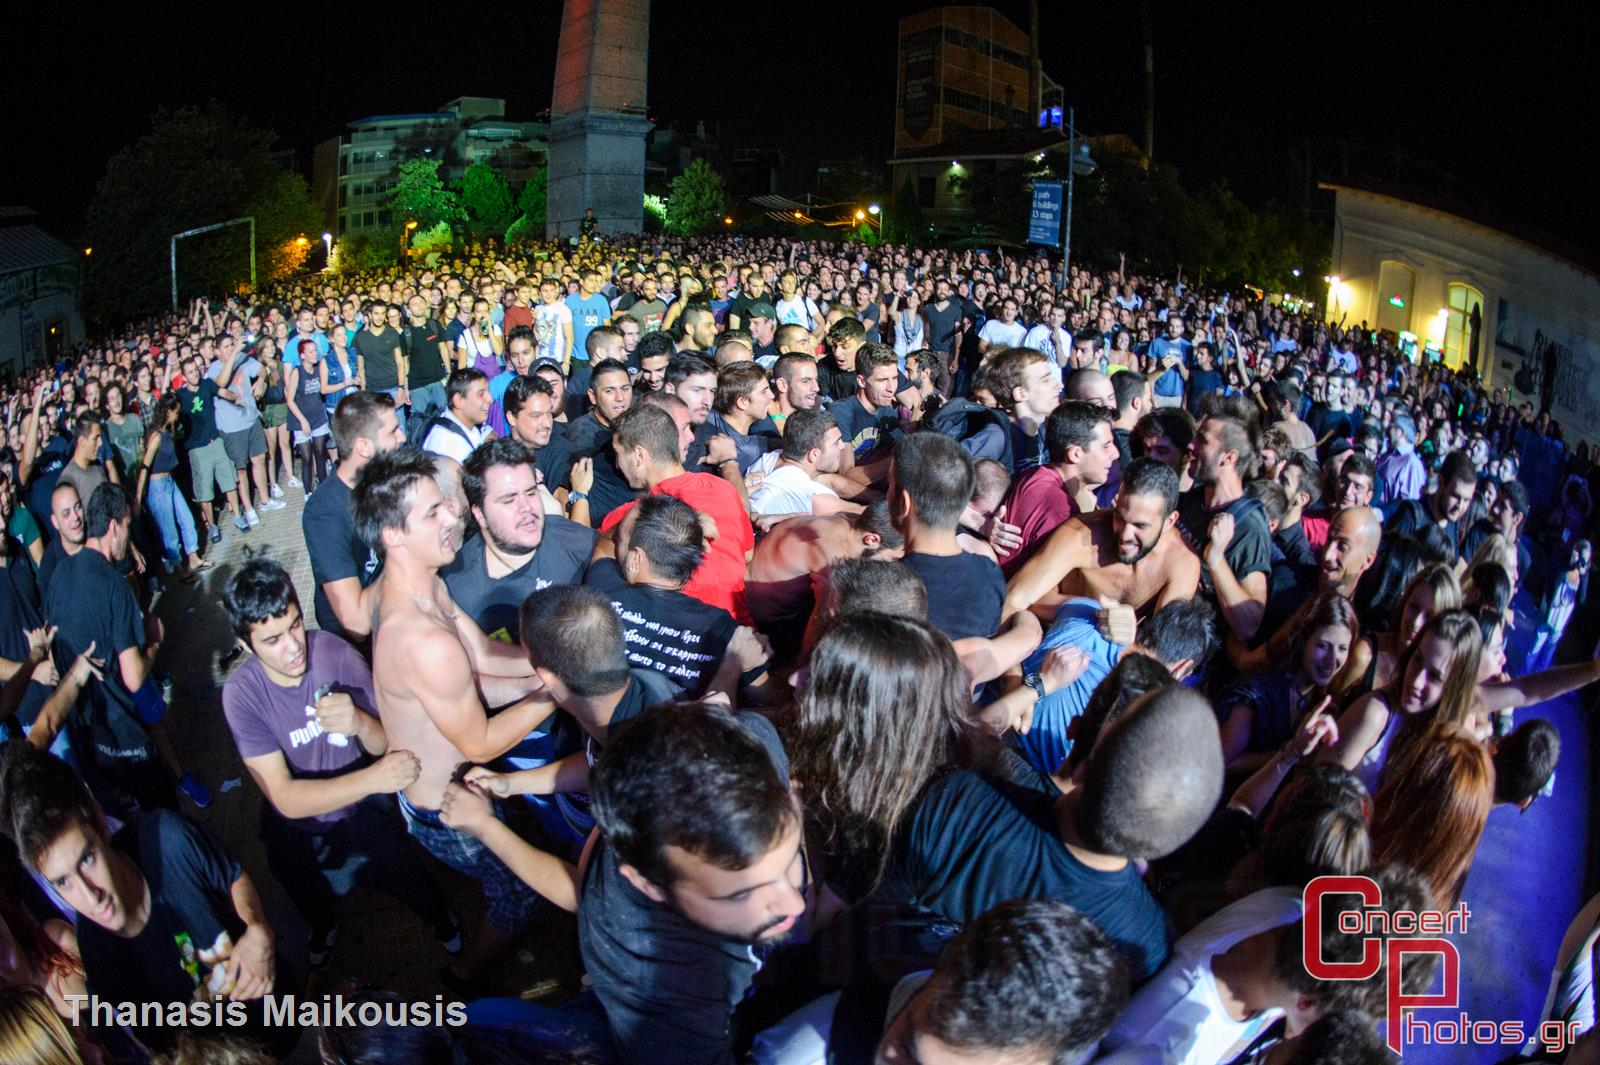 Active Member - Τραγούδα μας να φύγει το σκοτάδι- photographer: Thanasis Maikousis - concertphotos_-5099